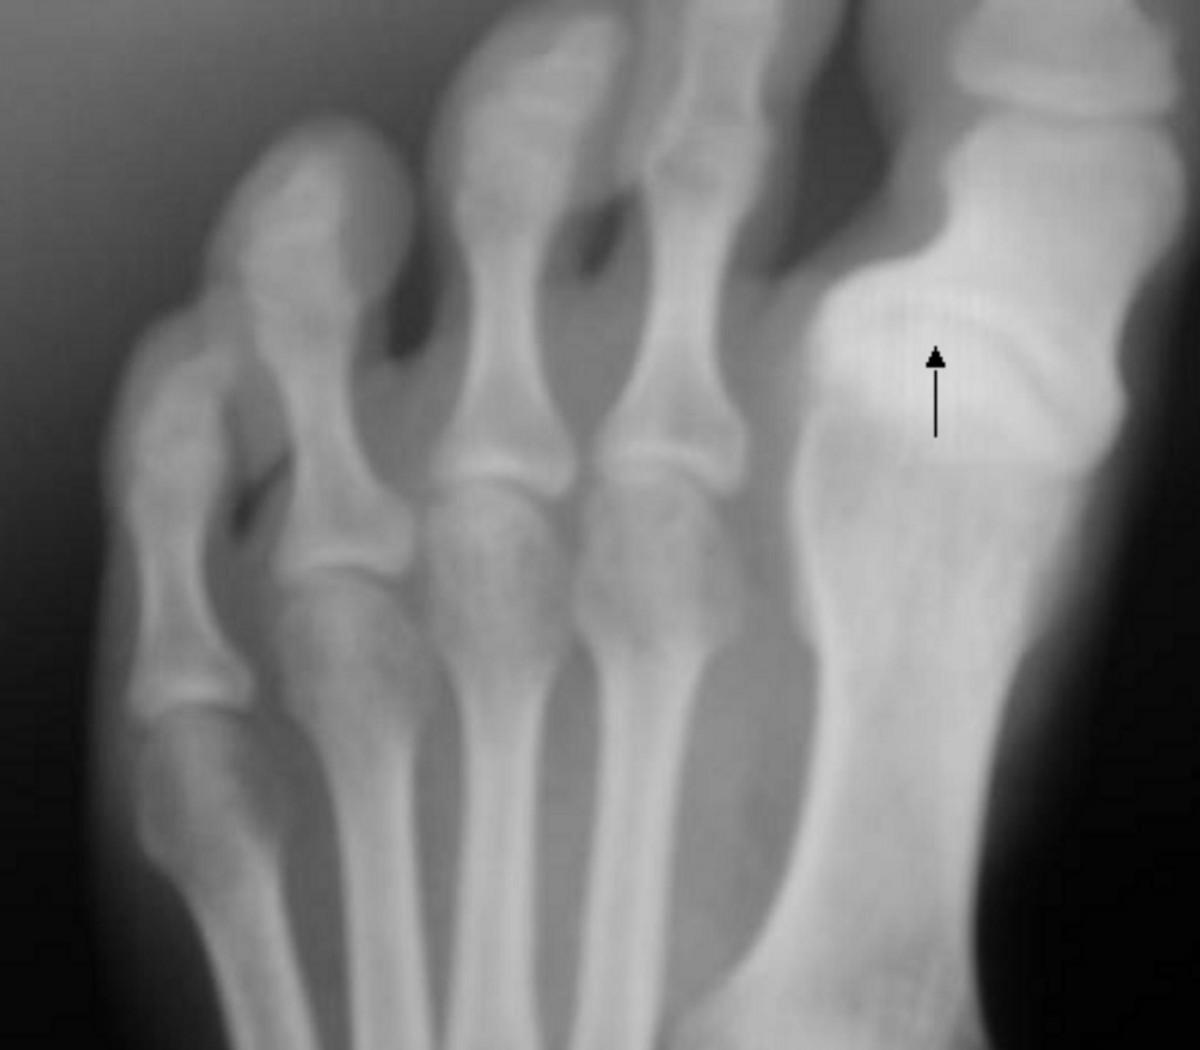 Artros foten